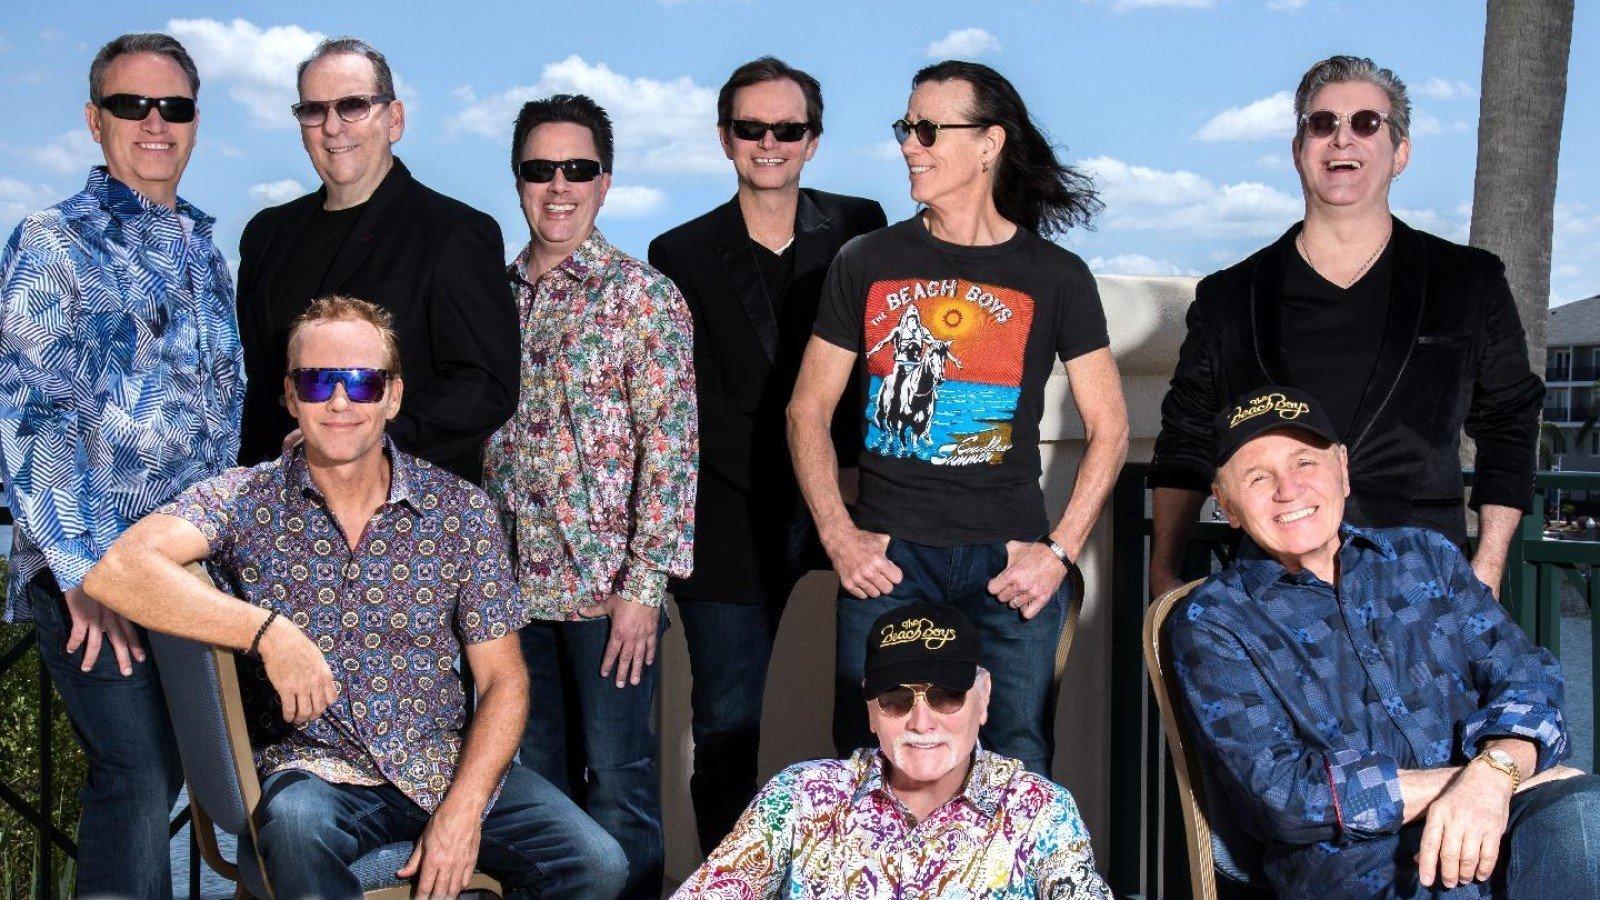 Beach Boys to perform at Cornbury Music Festival 2019